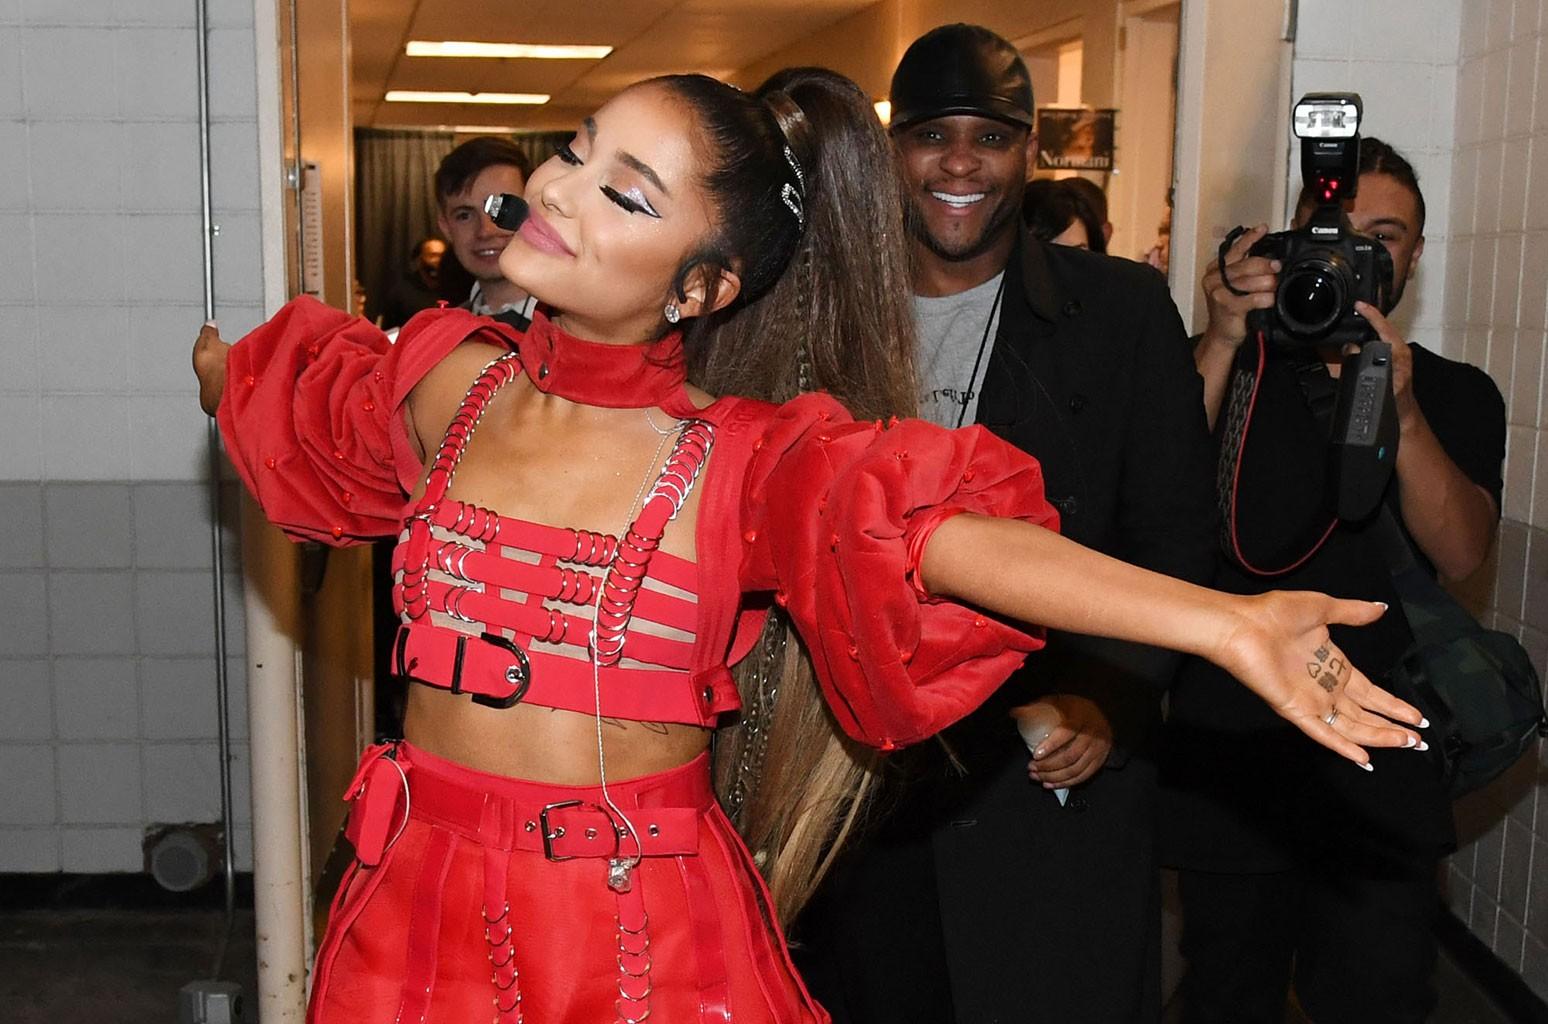 Ariana Grande Normani Embrace In New Flawless Portraits See The Pics Billboard Billboard